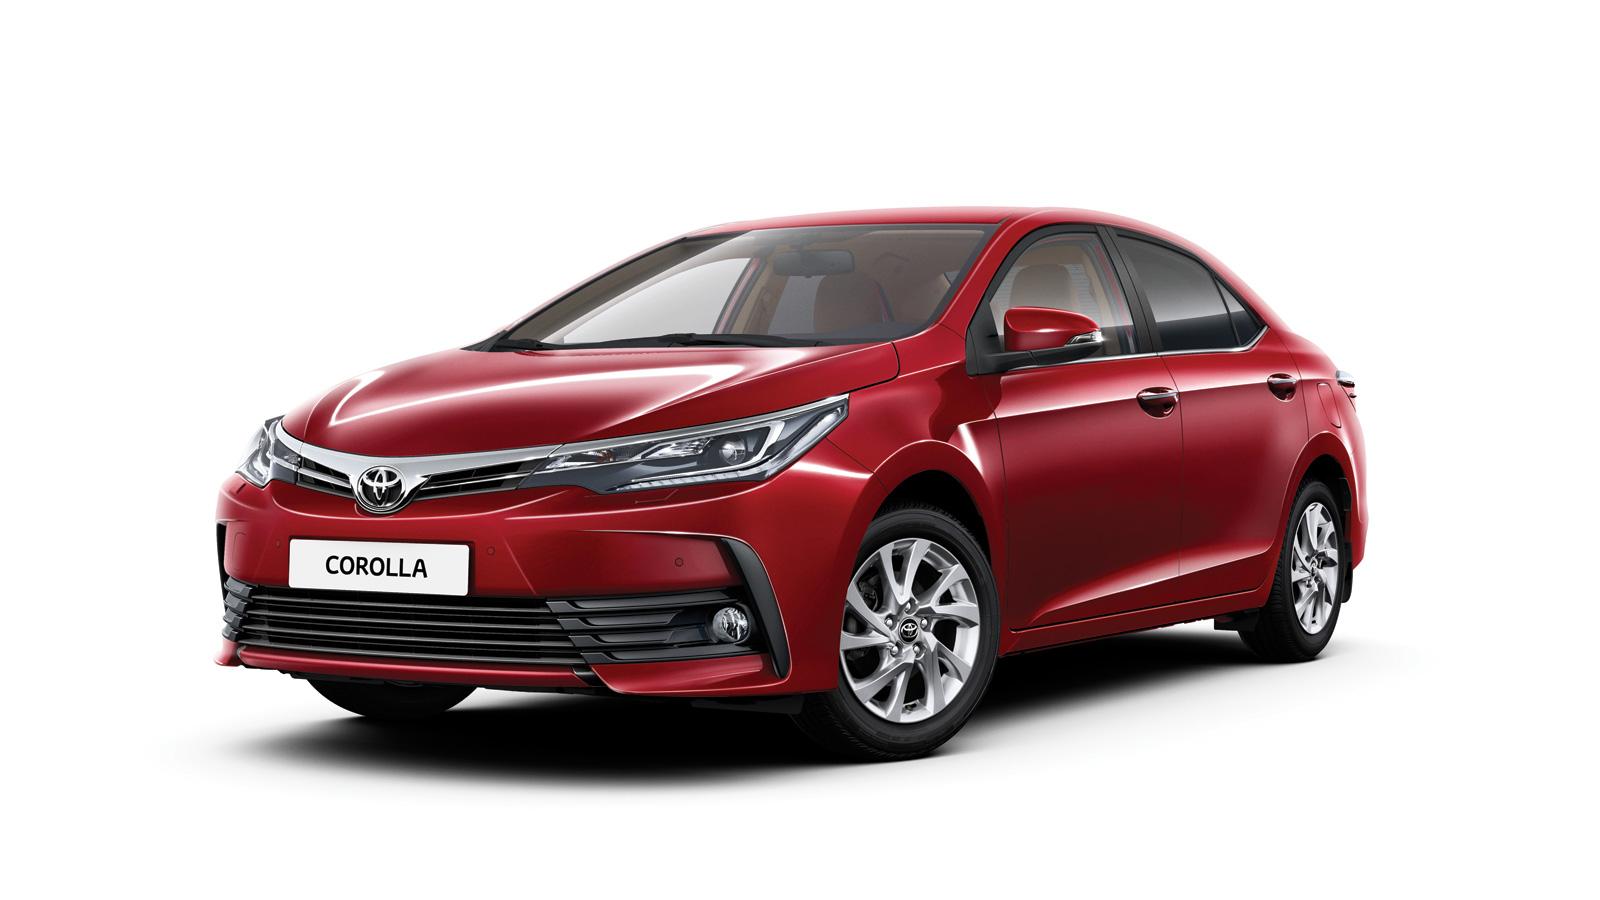 2019 Toyota Corolla 1.6 Dream Multidrive S